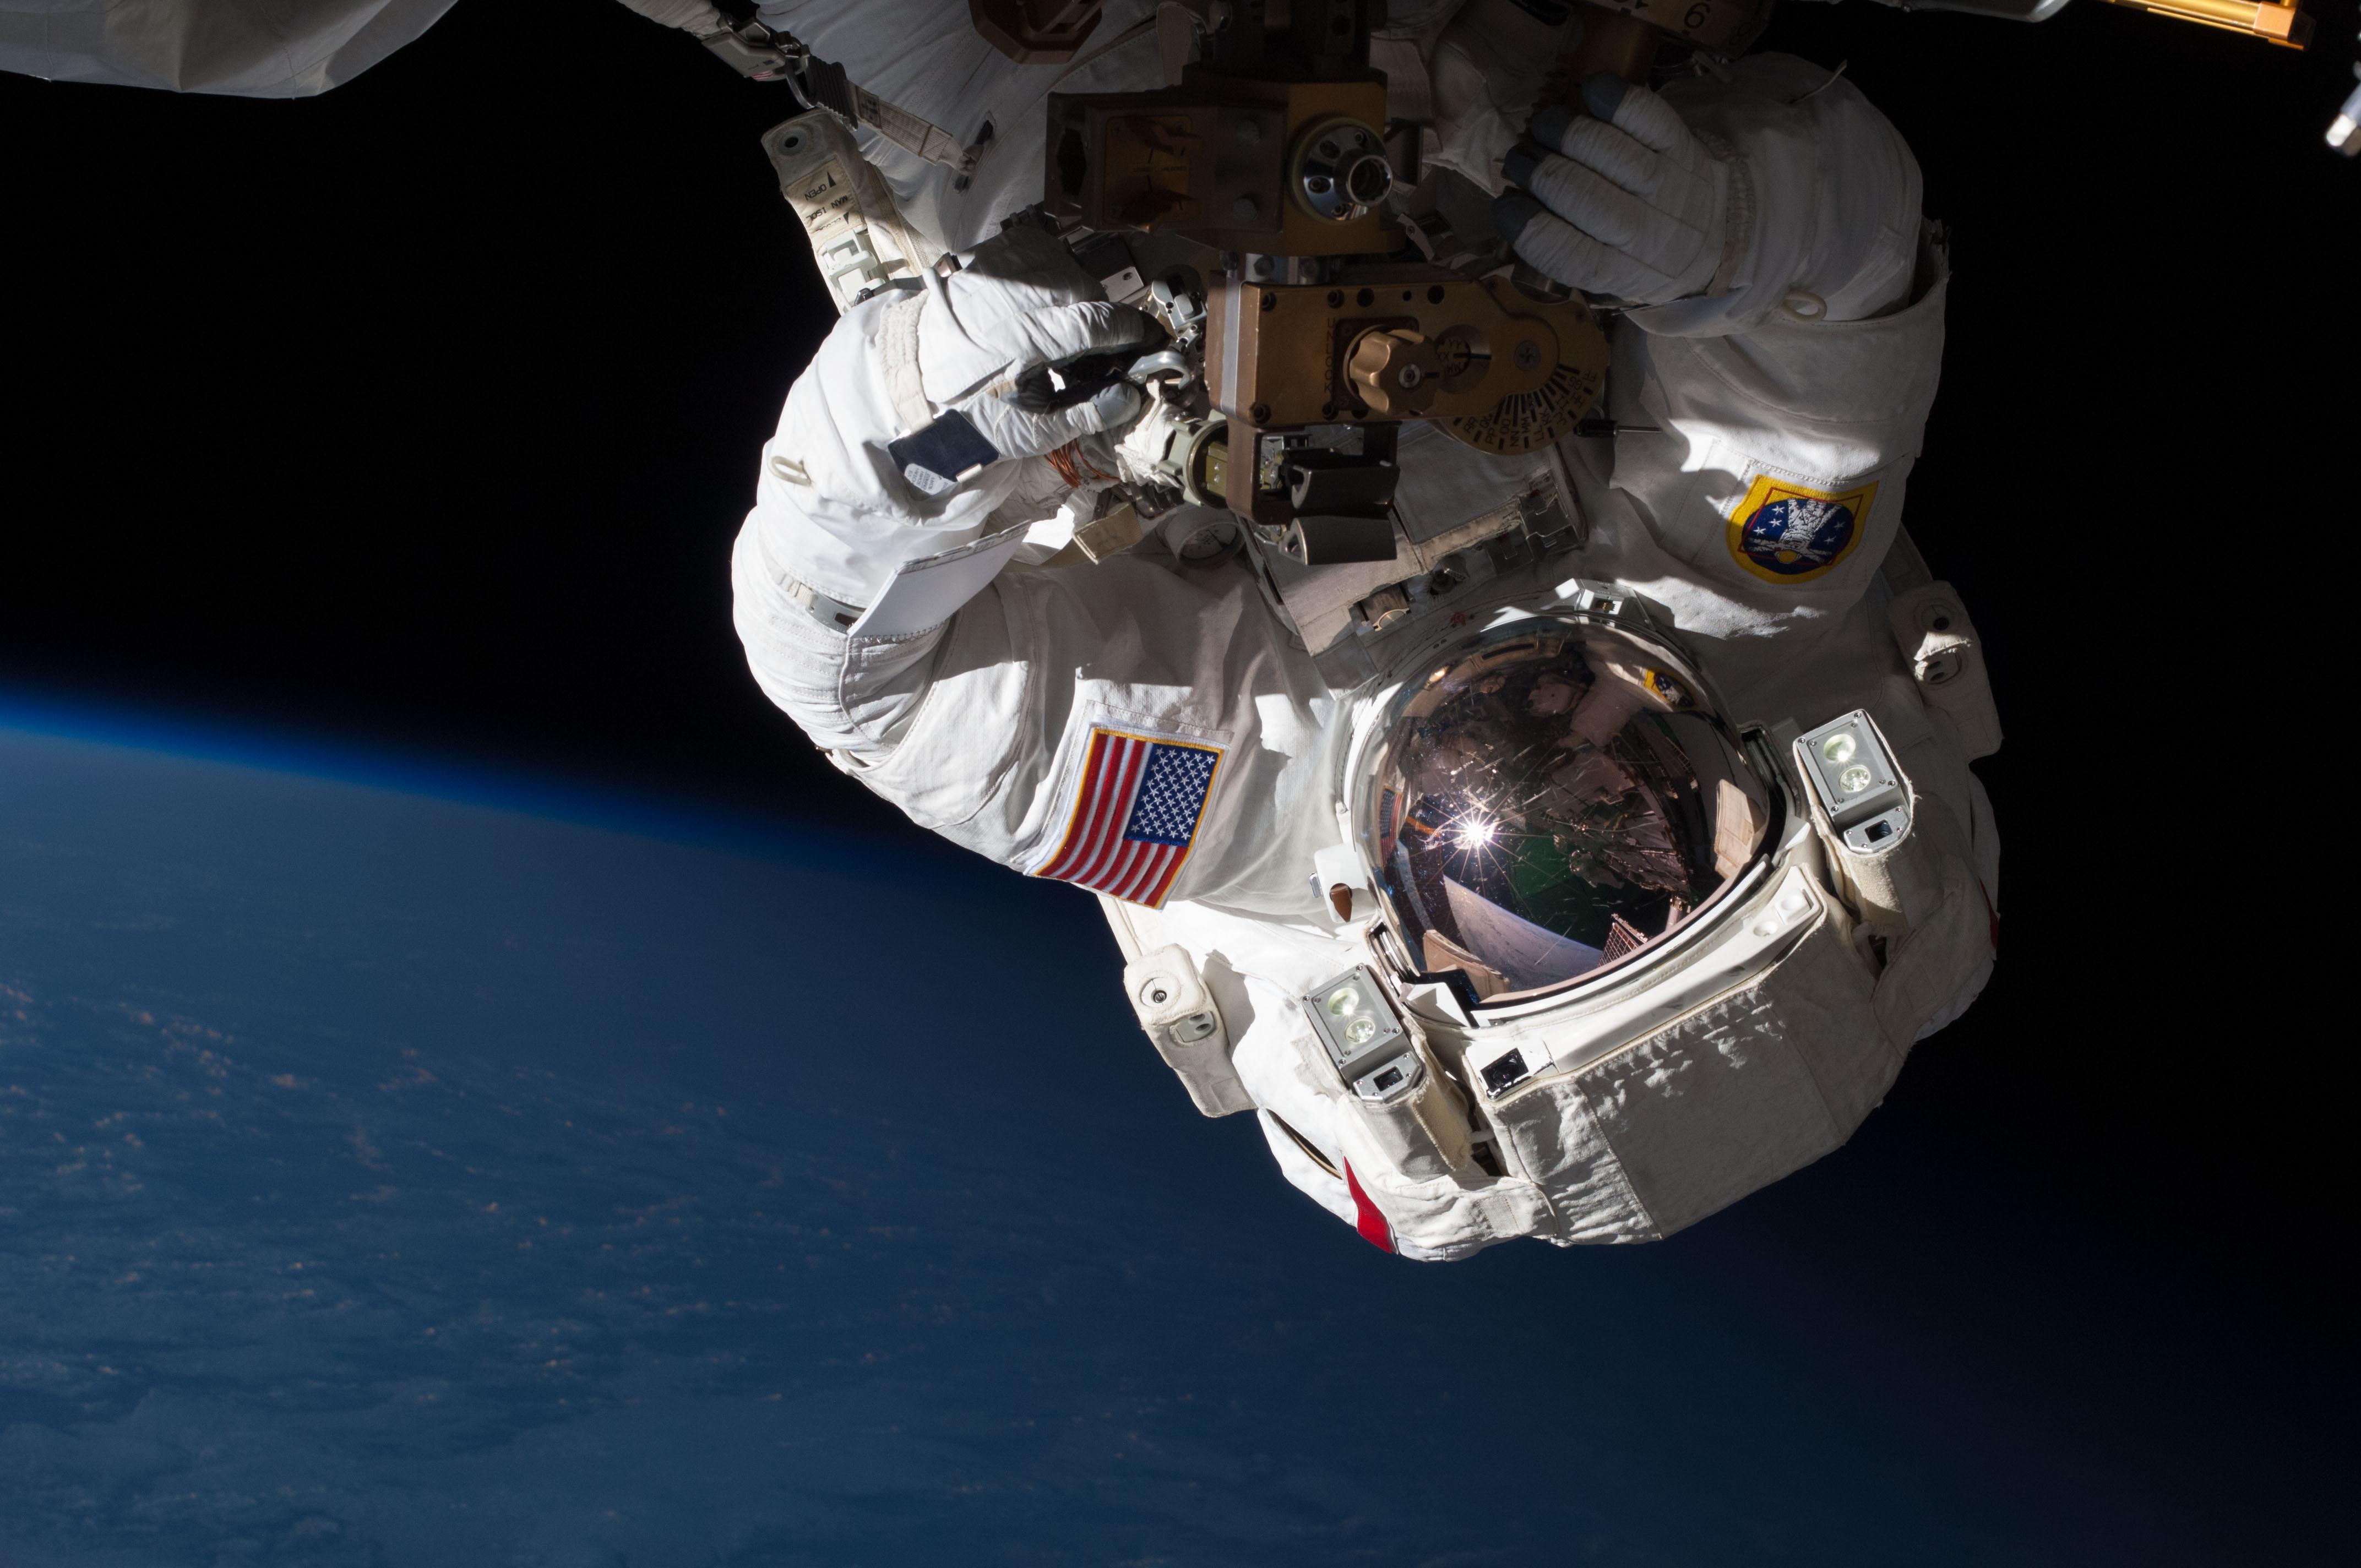 748392main_spacewalk_iss_full_full.jpg